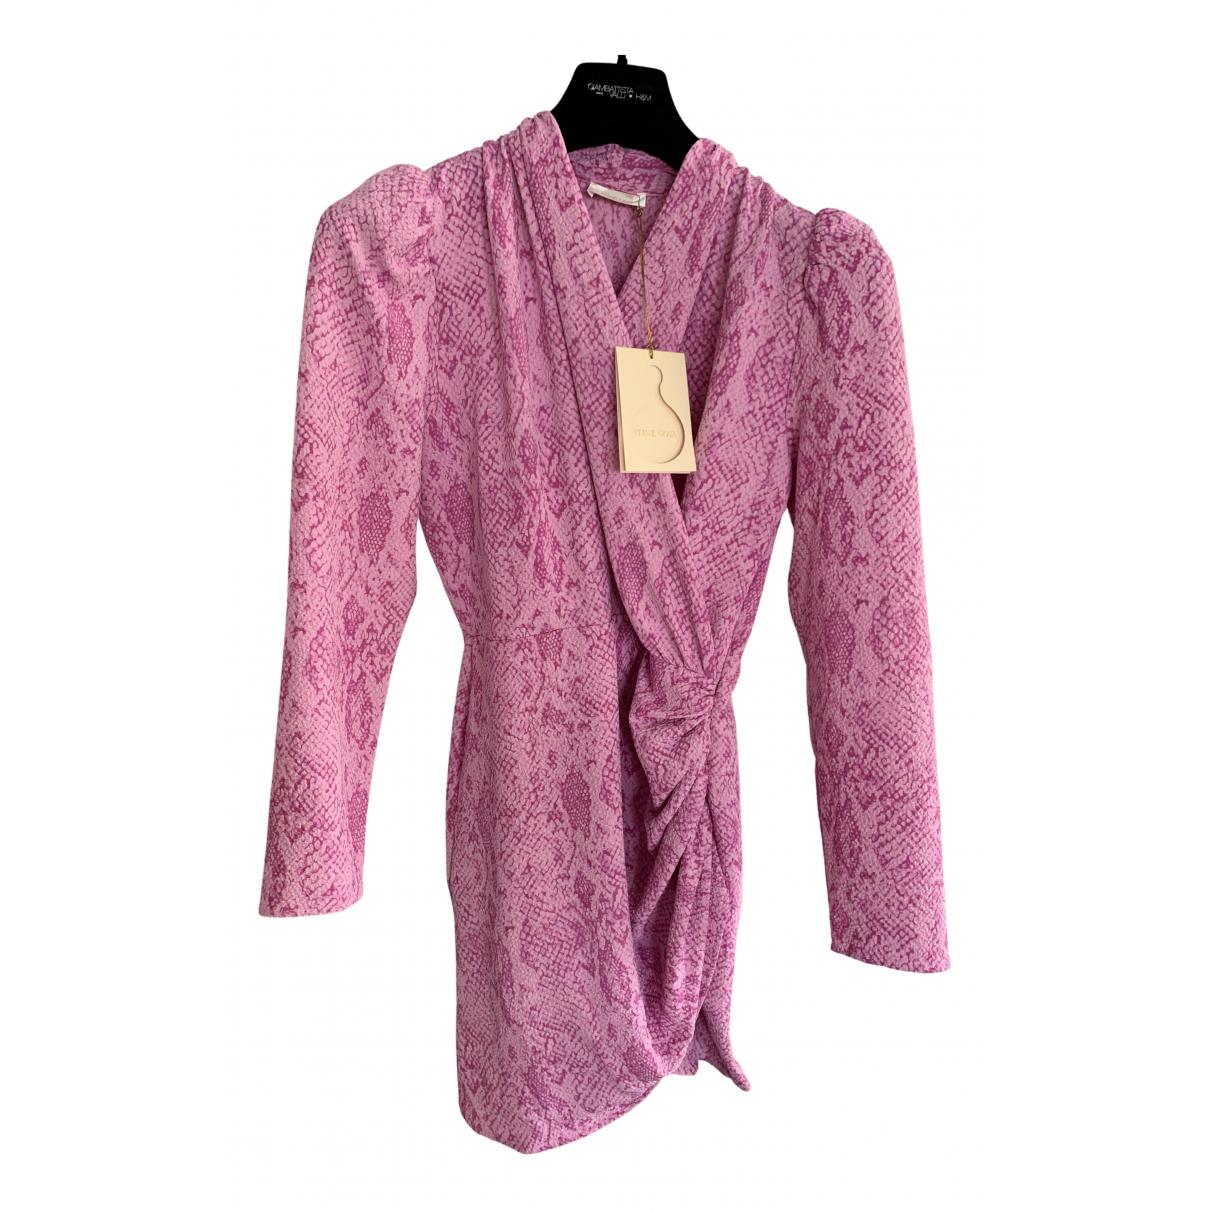 Stine Goya \N Kleid in  Rosa Polyester